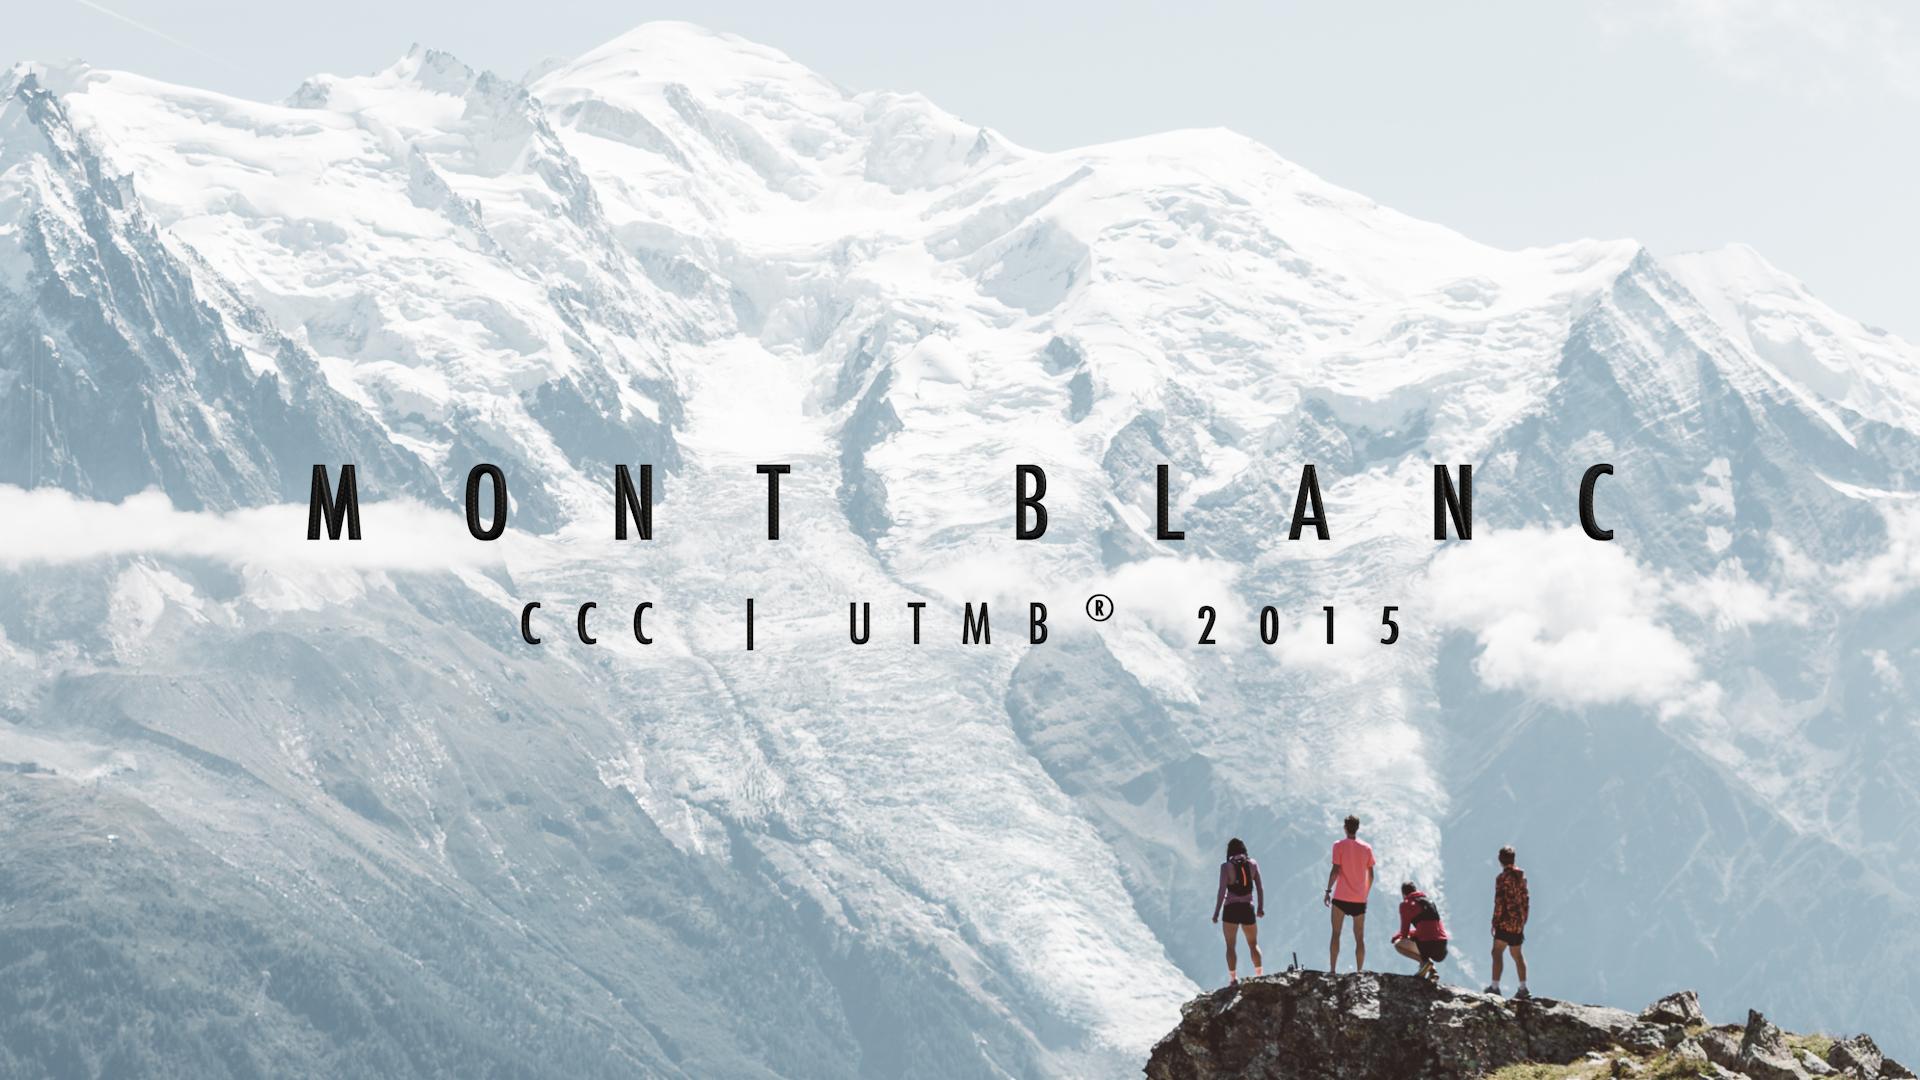 MontBlancMovie-SFRunningCo